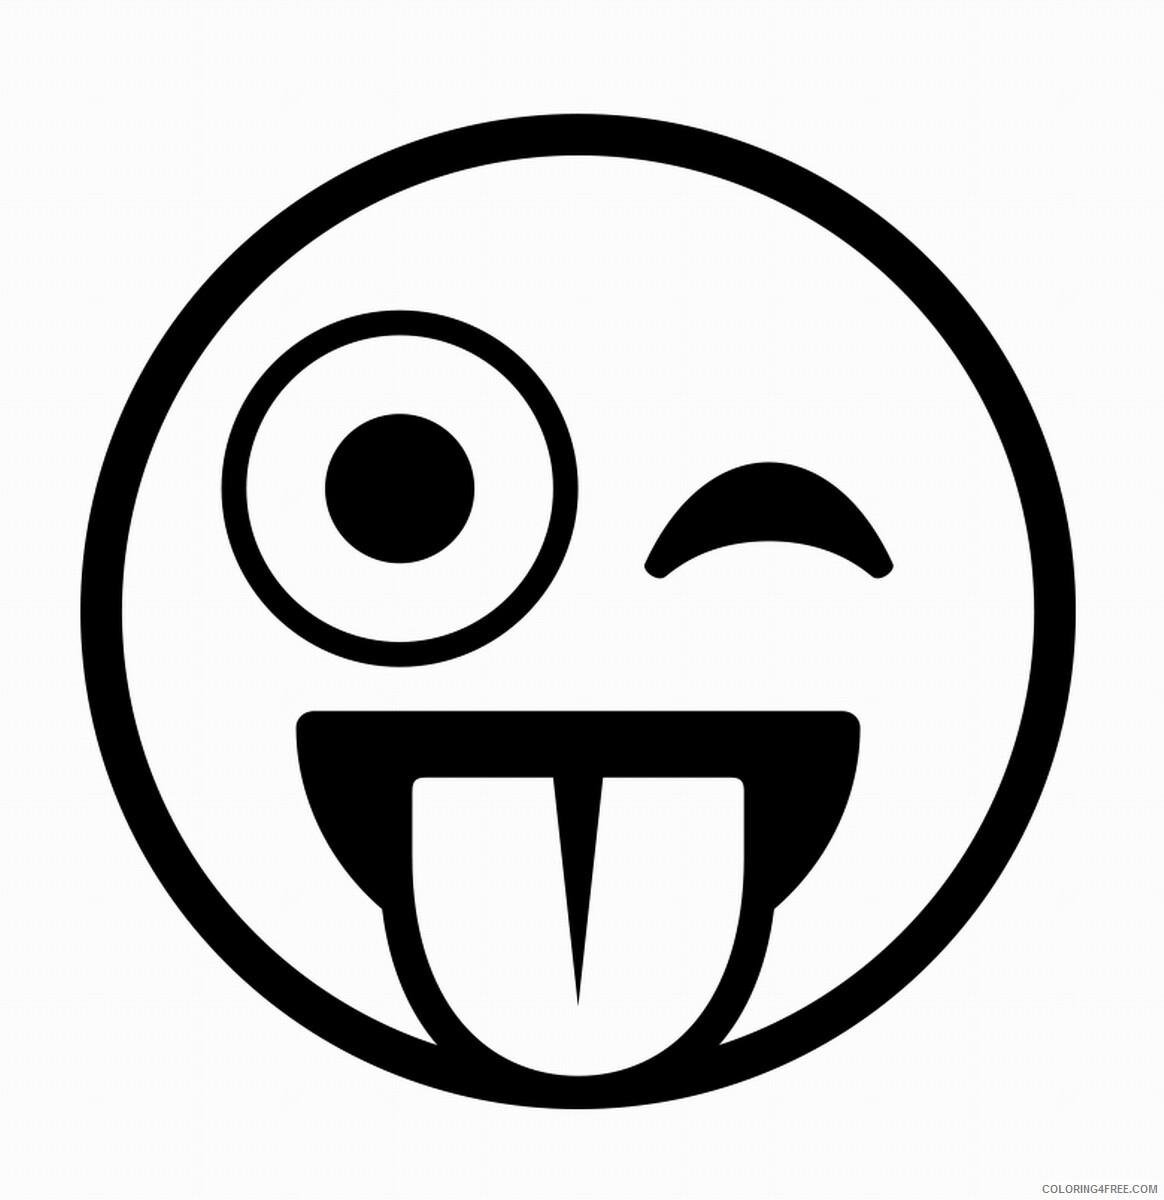 Emoji Coloring Pages Emoji Printable 2021 2175 Coloring4free